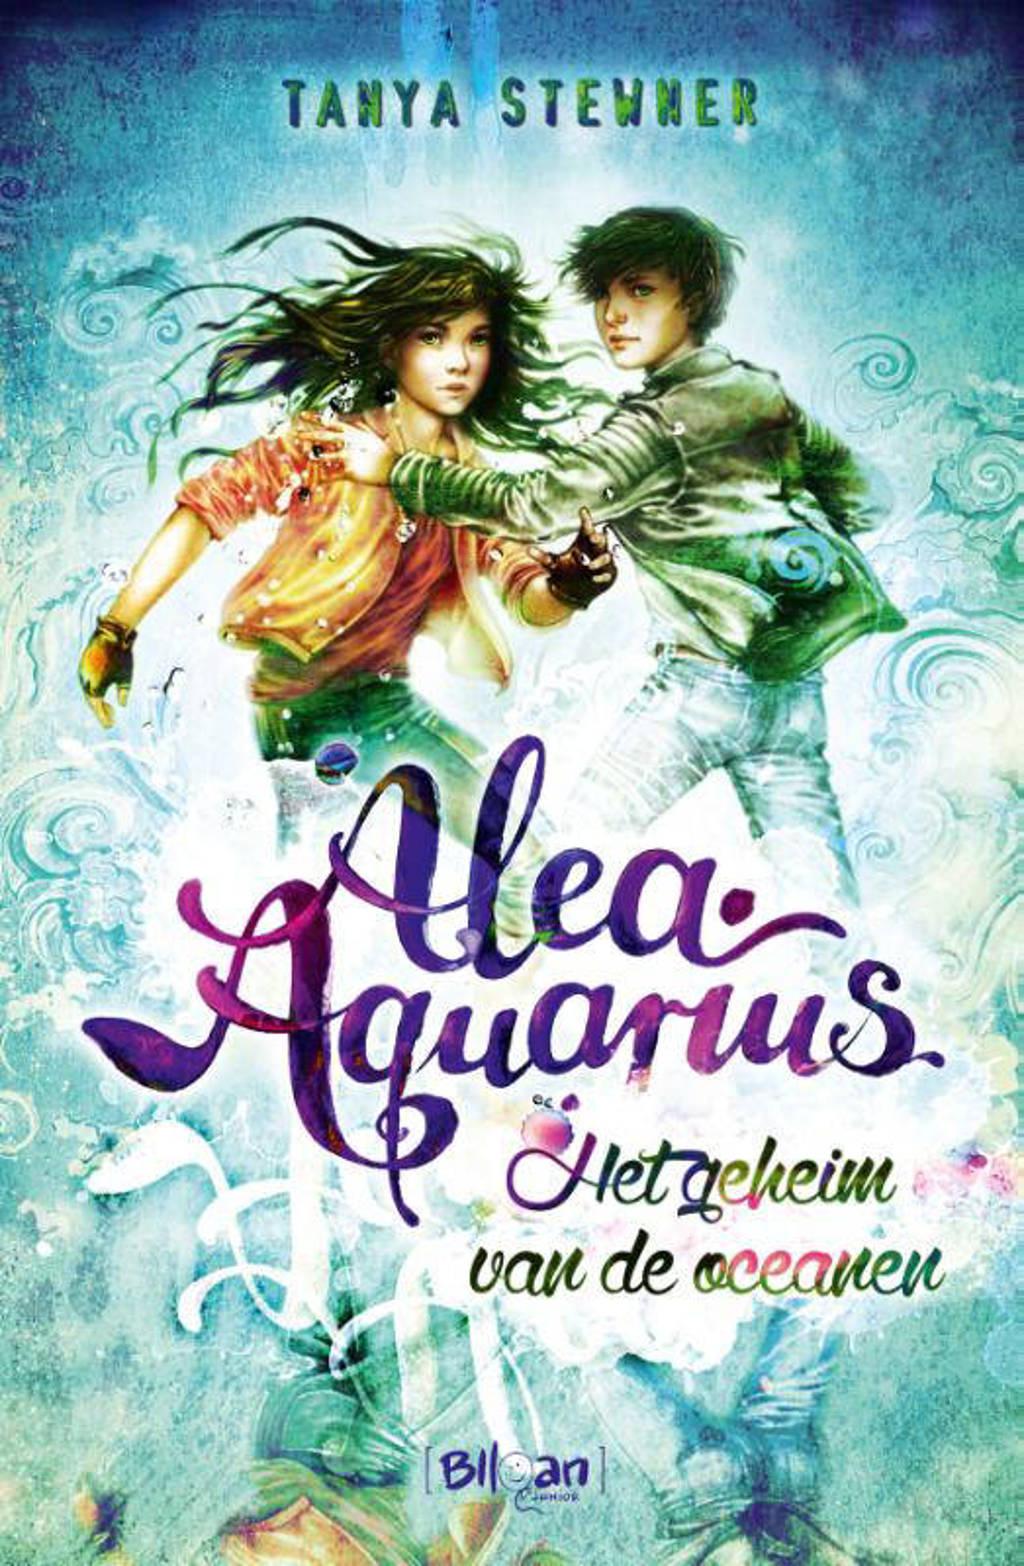 Alea Aquarius: Het geheim van de oceaan - Tanya Stewner